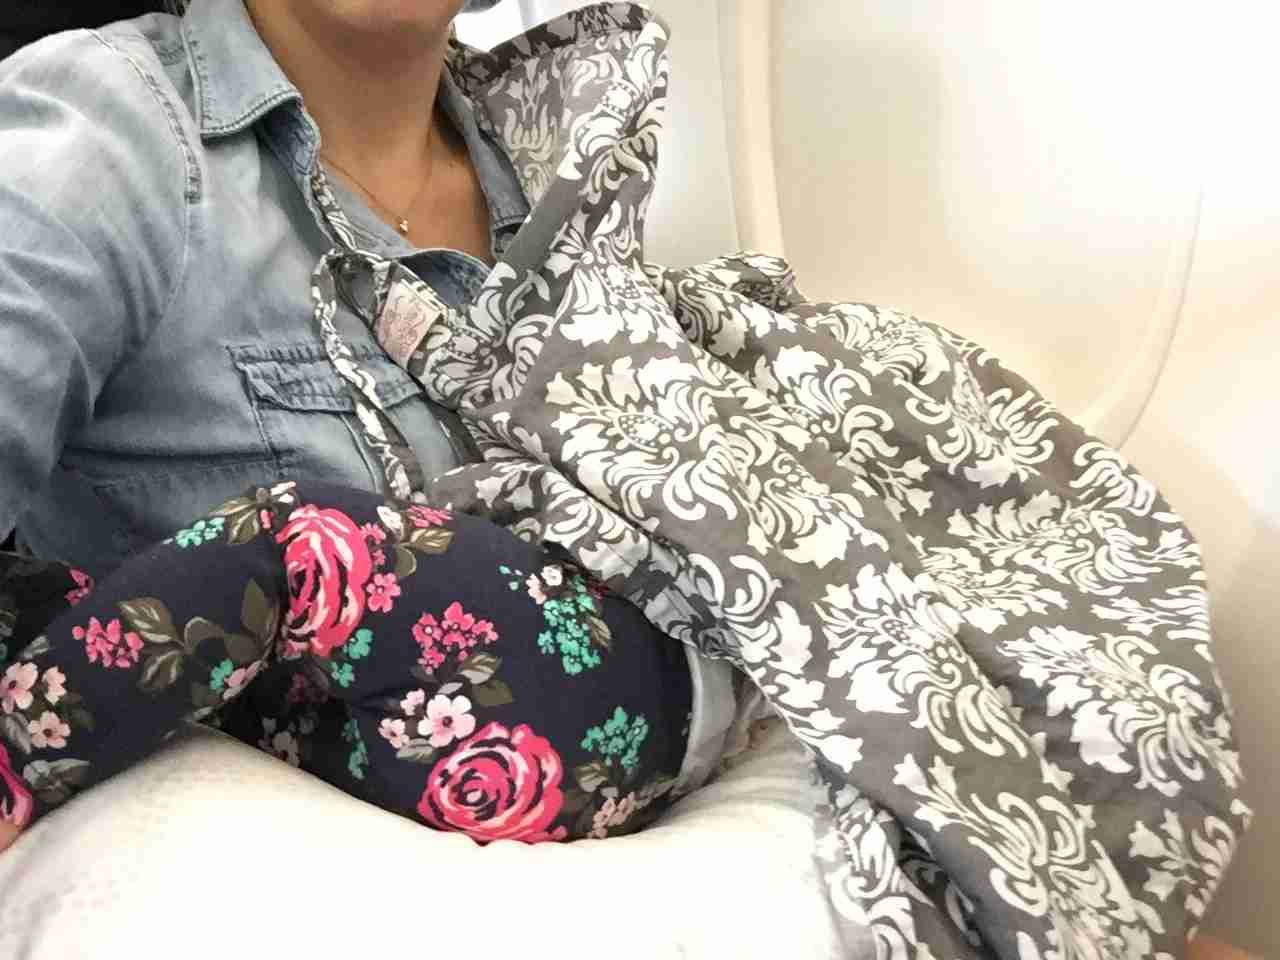 Baby nursing on a plane